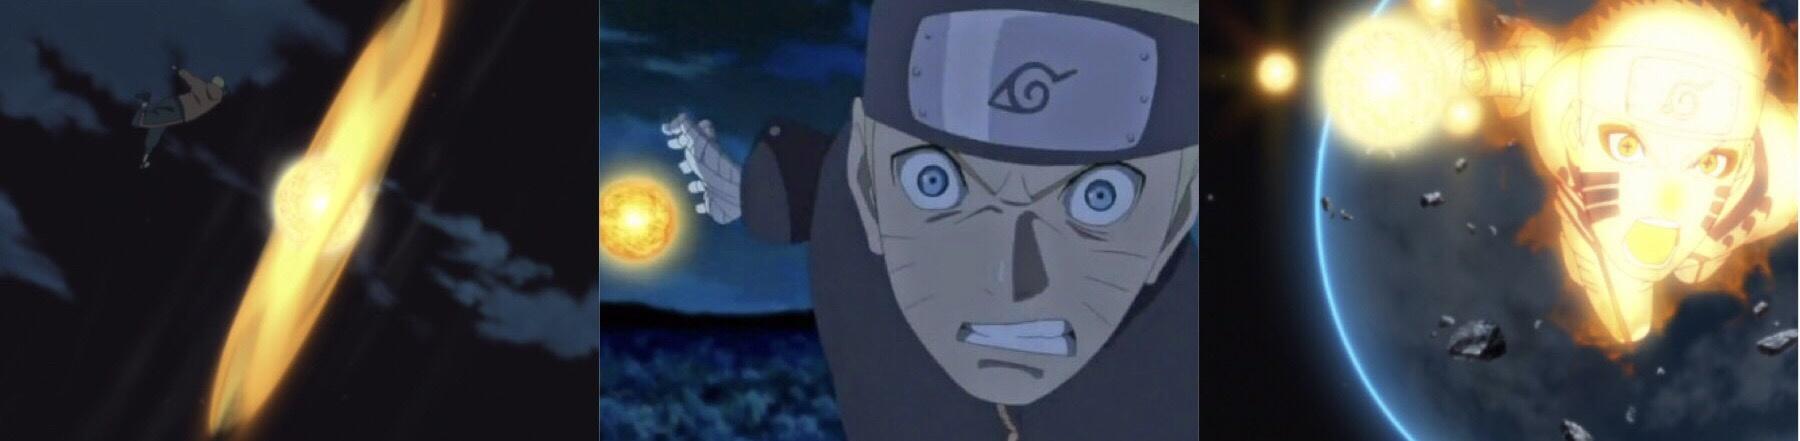 Naruto Shippuden Episode 362 English Dubbed Free Download